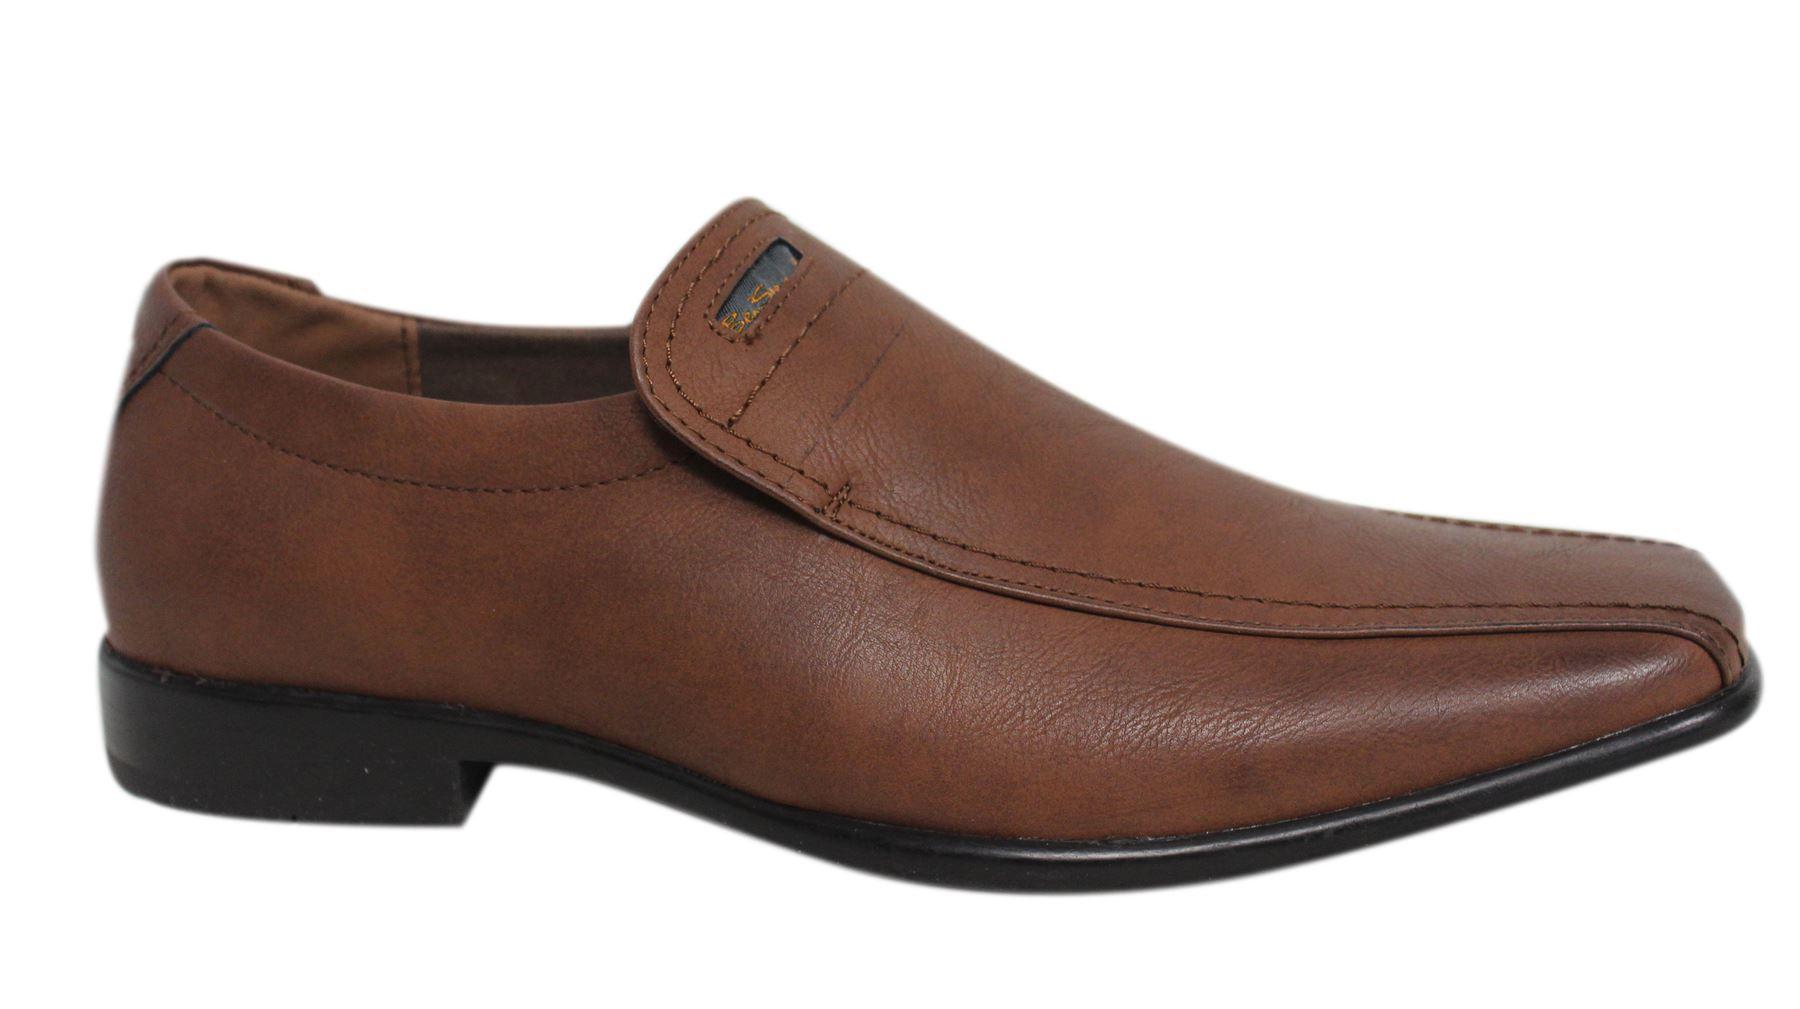 Ben Sherman Duram Slip On Dark Tan Synthetic Mens Loafers Shoes BEN3158 076 U84